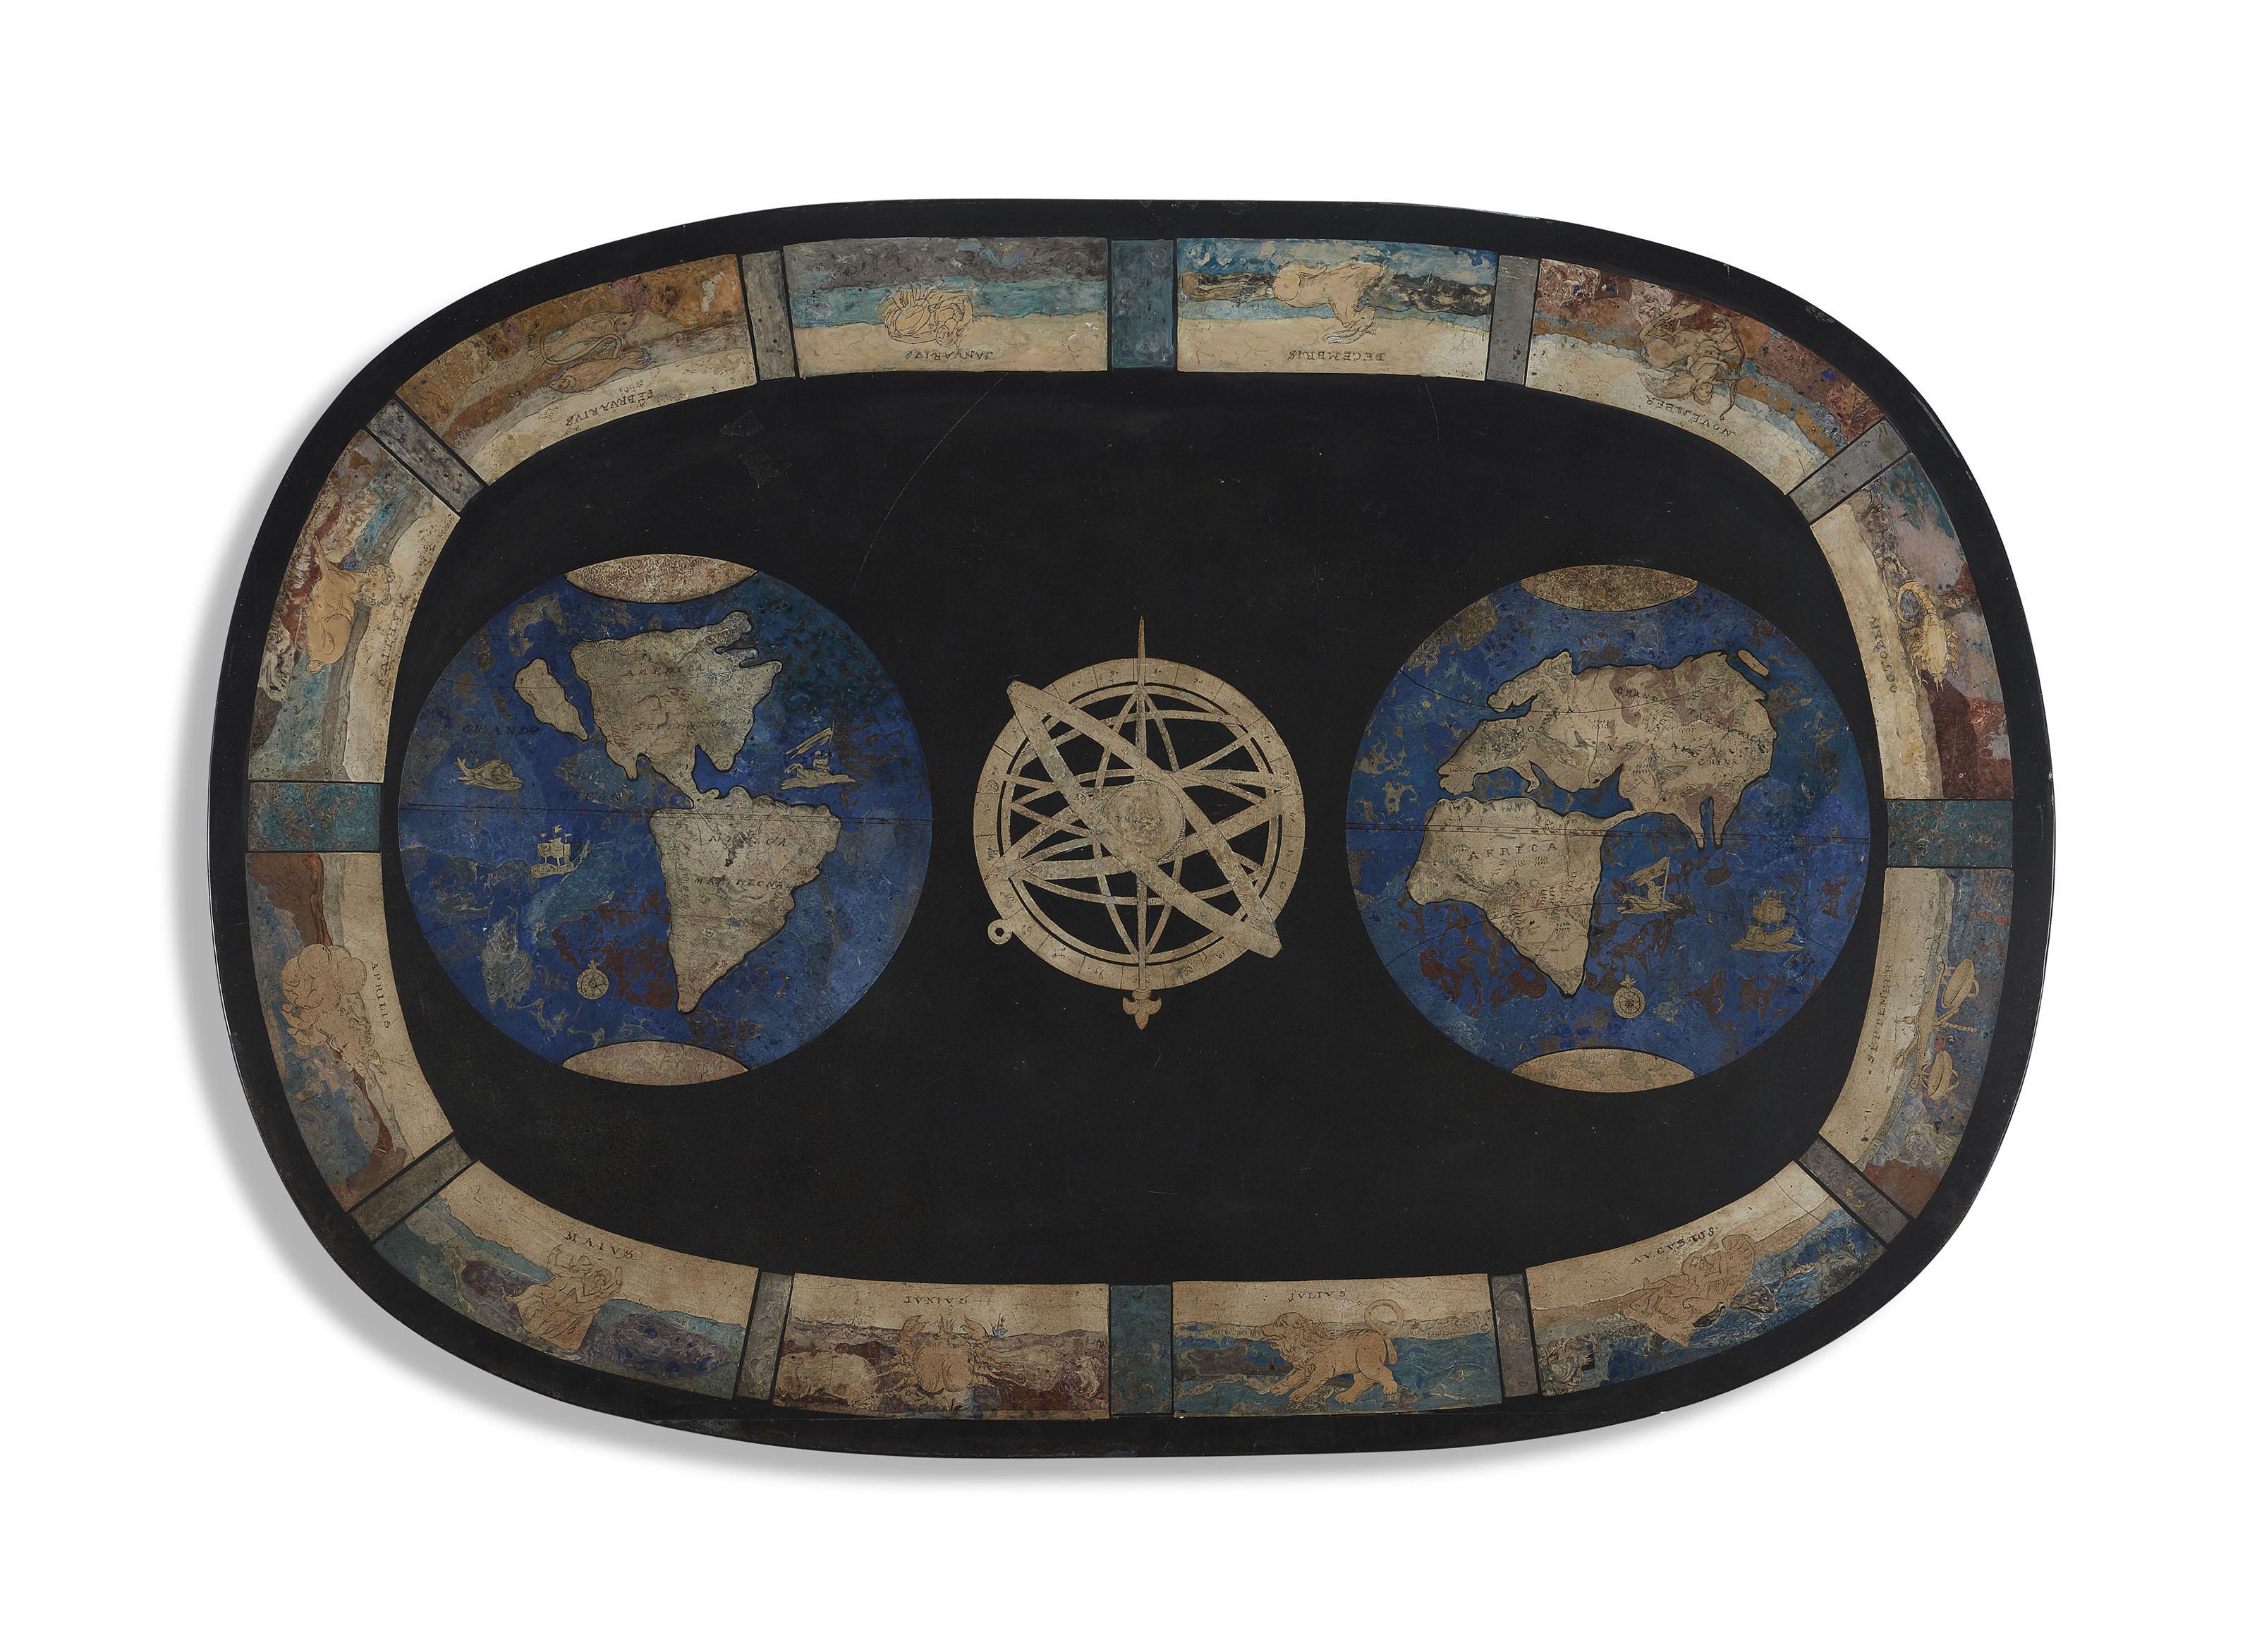 plateau de table ovale de style baroque